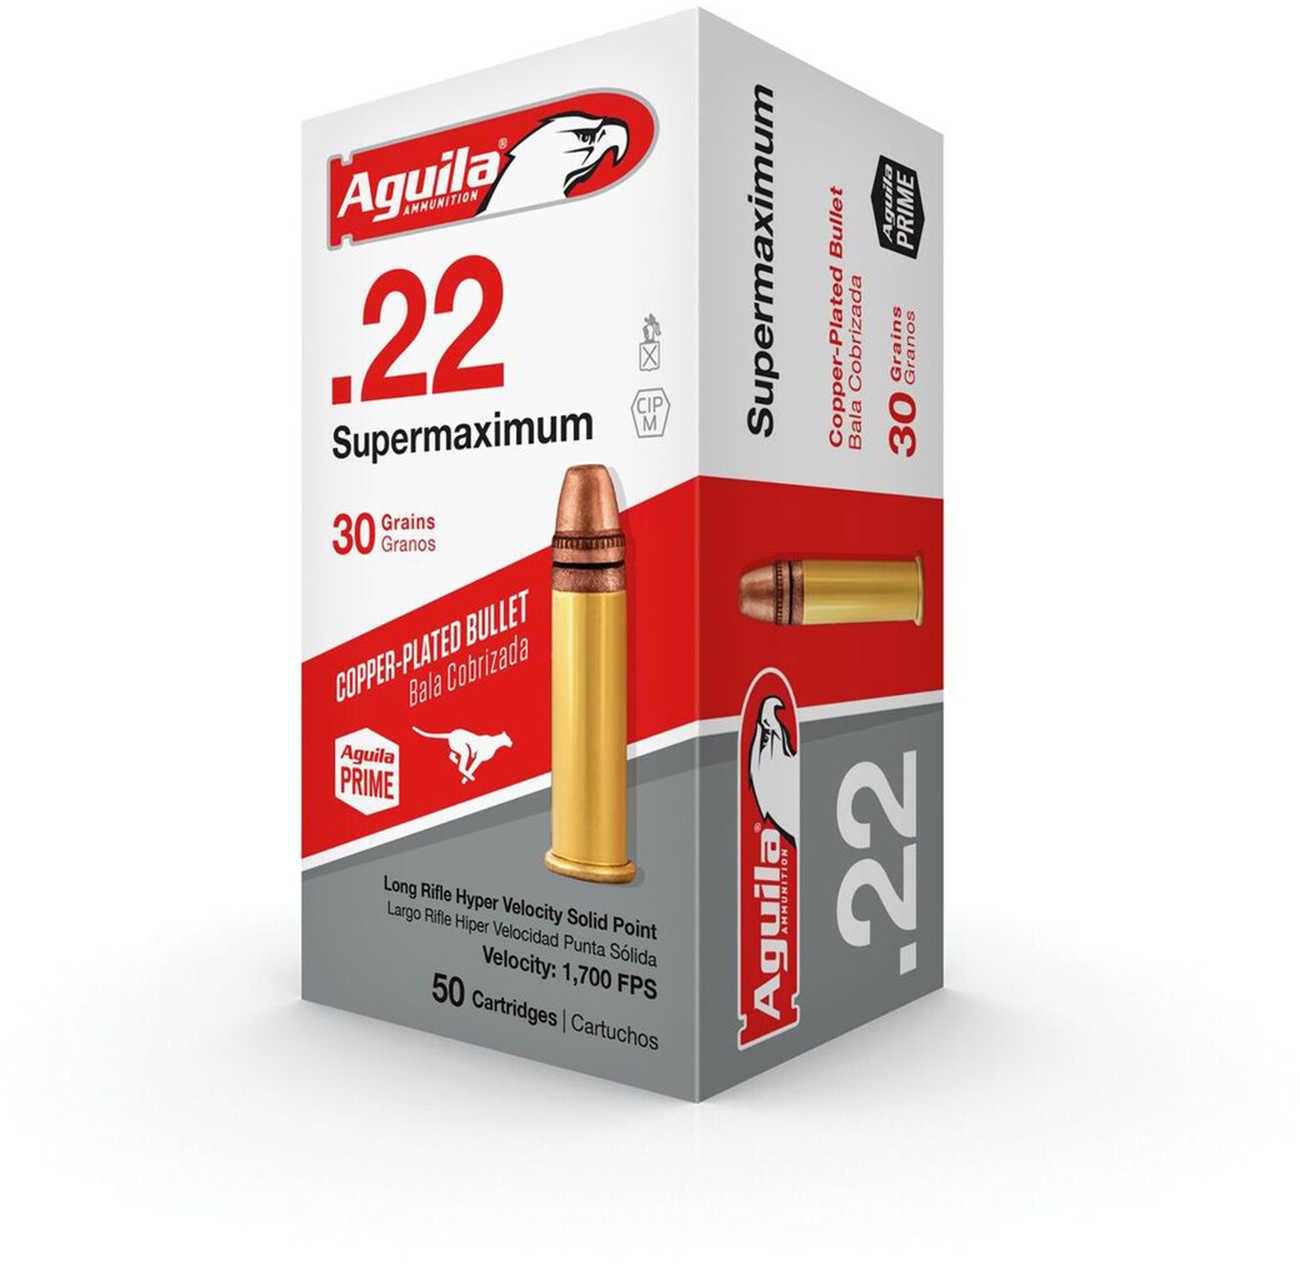 Aguila Ammunition Supermaximum Hyper Velocity 22LR 30 Grain Copper-Plated Solid Point 1B222298